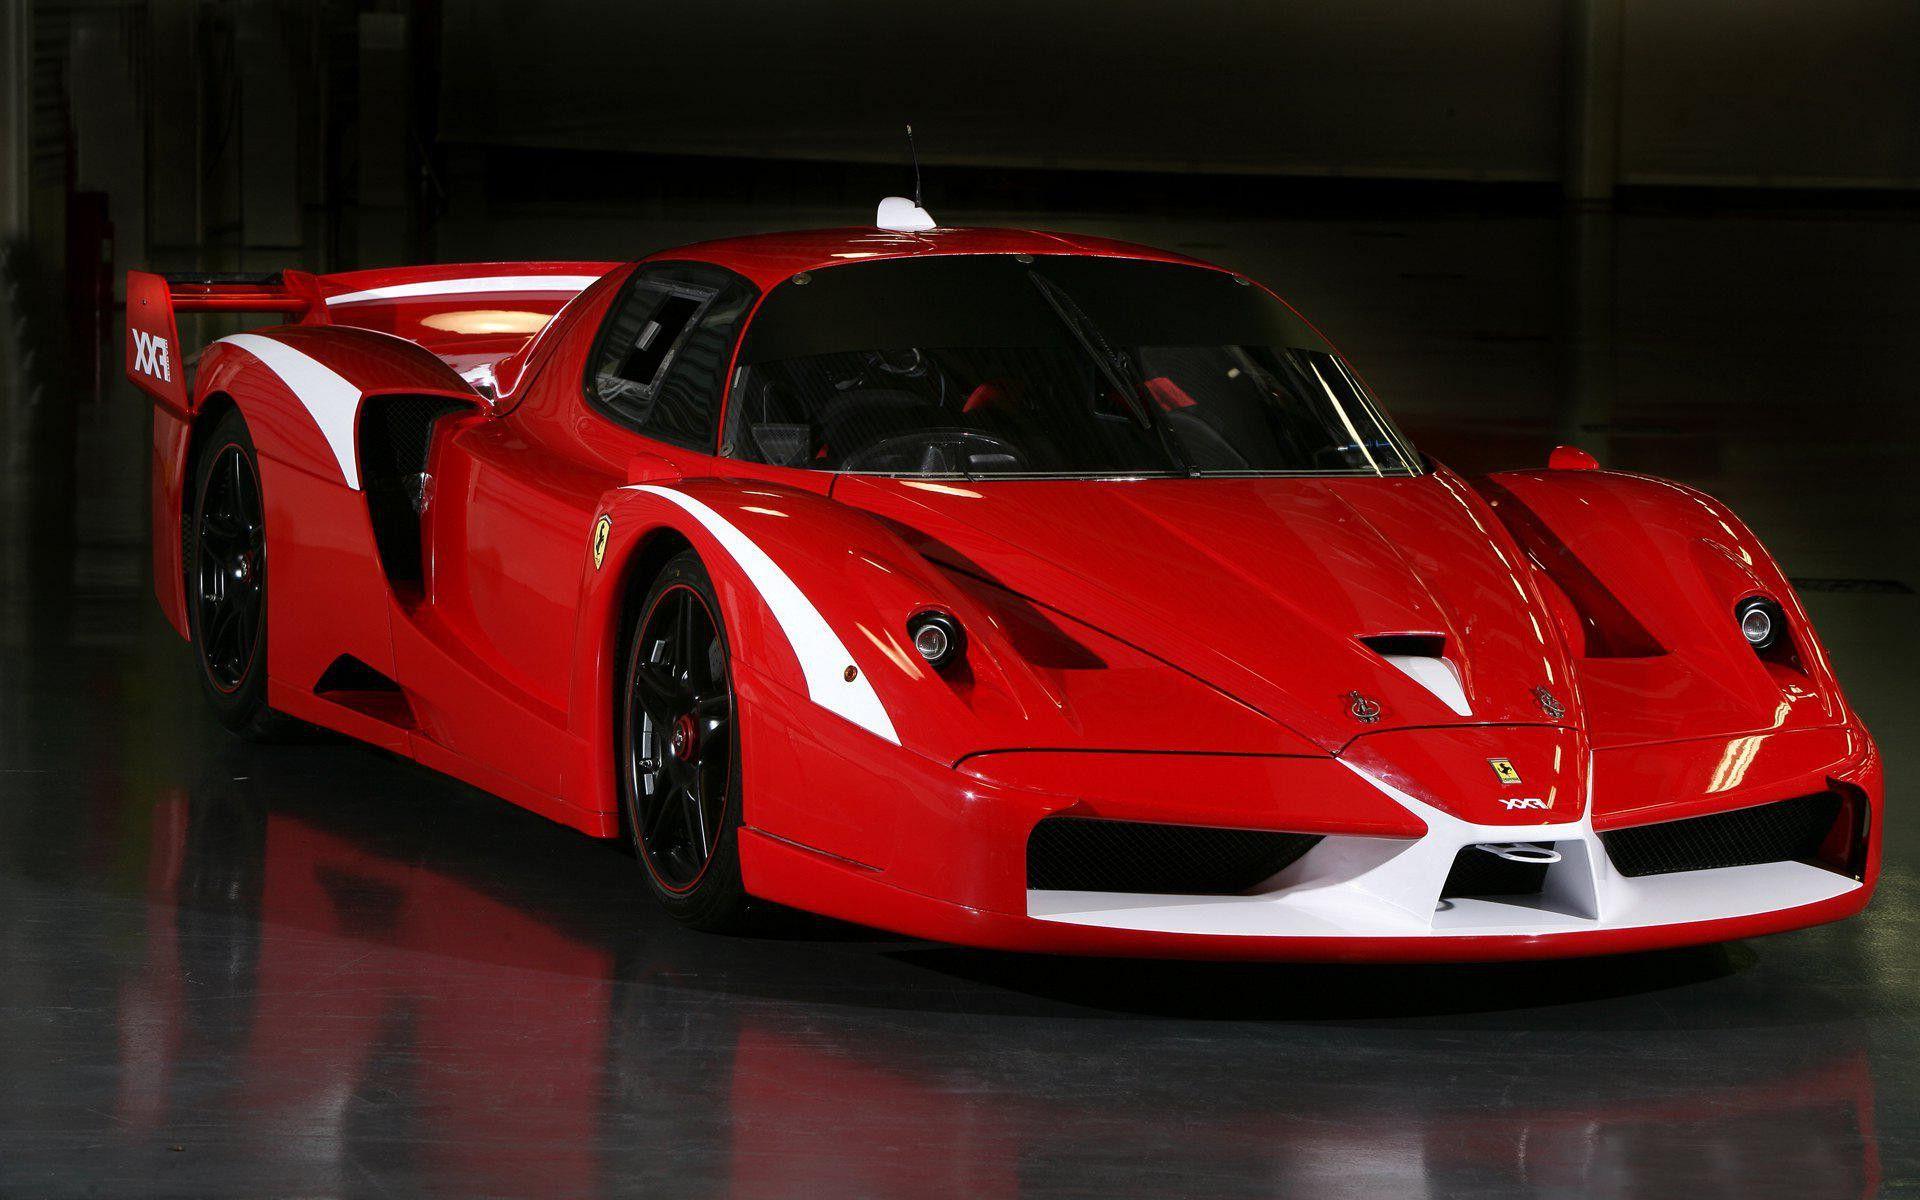 Ferrari Fxx Evoluzione Hd Wallpaper All Cars Wallpapers Ferrari